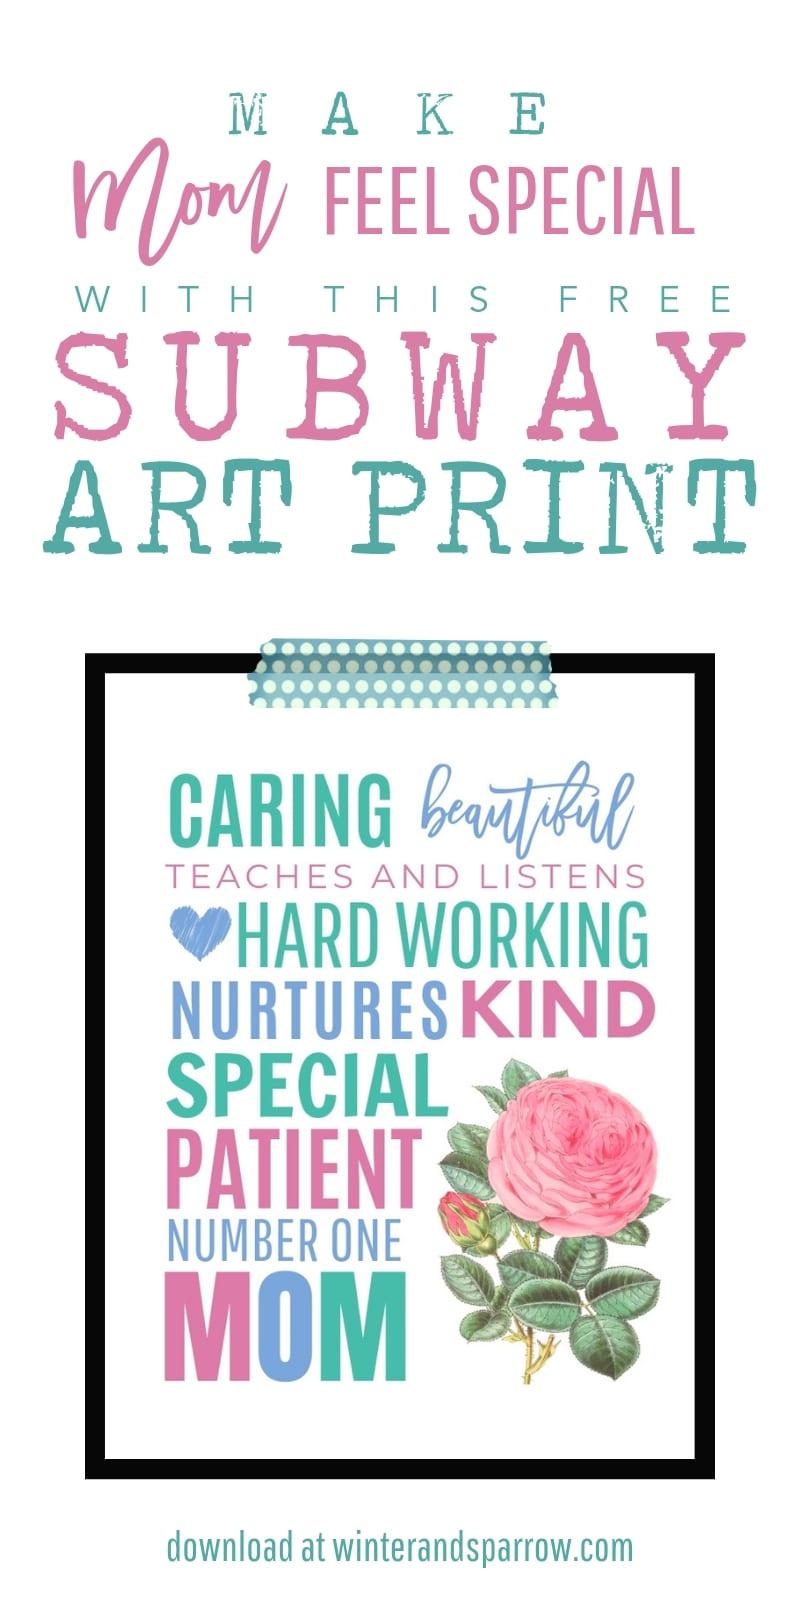 Free Mothers Day Printable: Give Mom A Framed Subway Art Print | winterandsparrow.com #subwayartprint #mothersdayprintable #mothersdaysubwayart #freemothersdayprintable